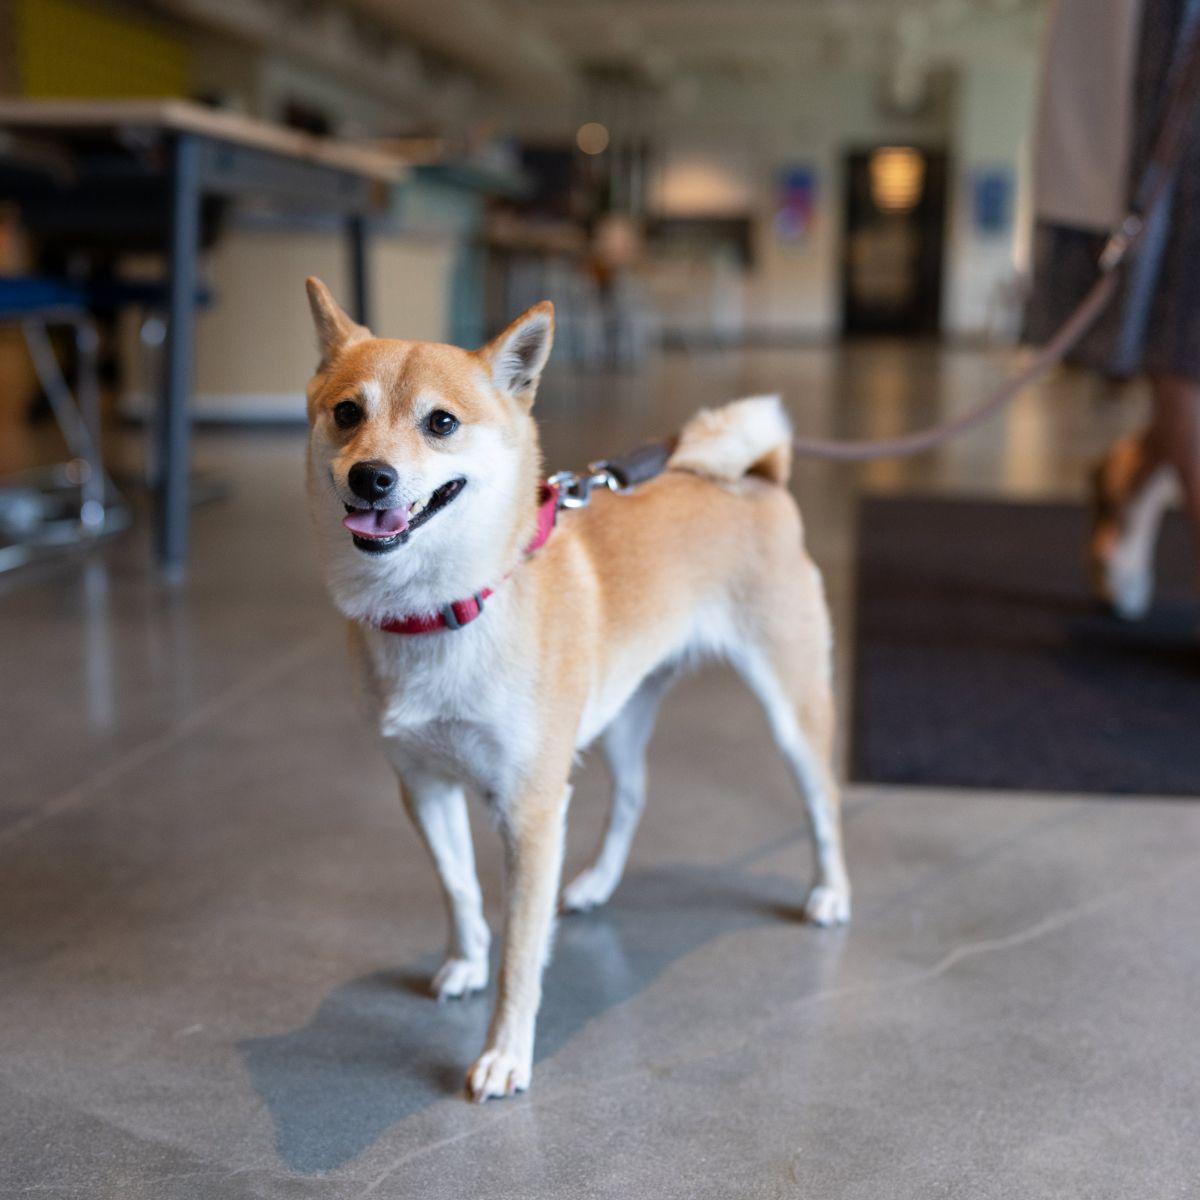 Kira, Heather Bown's Pup